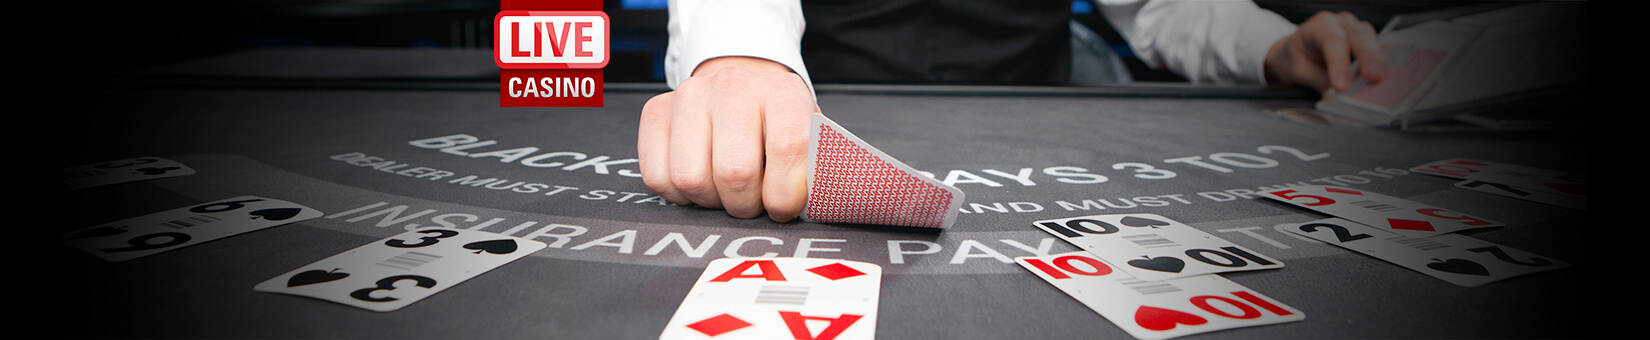 Beste Wettquoten ältestes Casino - 80288